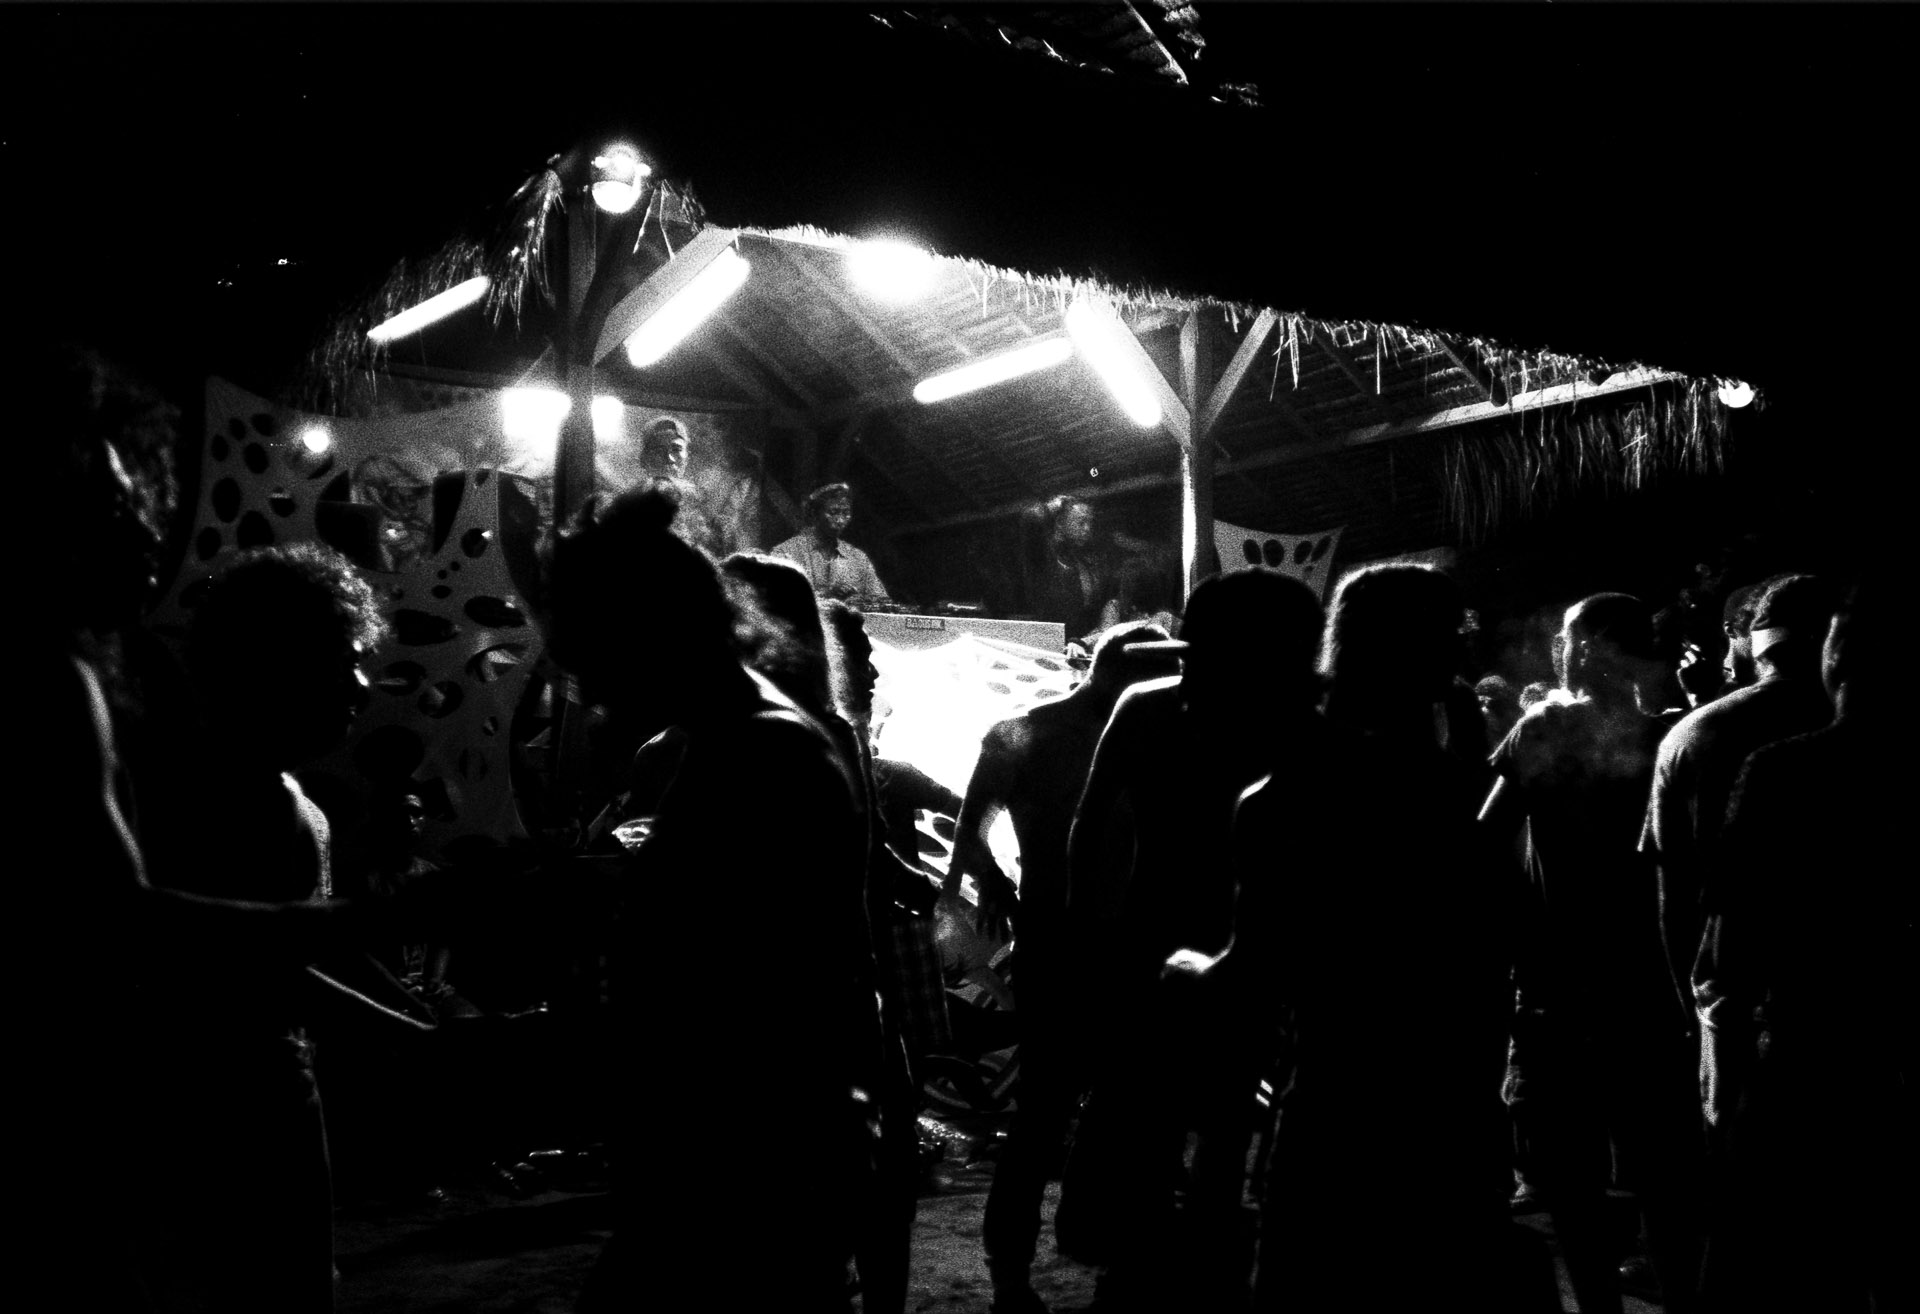 Gili Beach Party - Tri-X @1600, Canon Sureshot Max